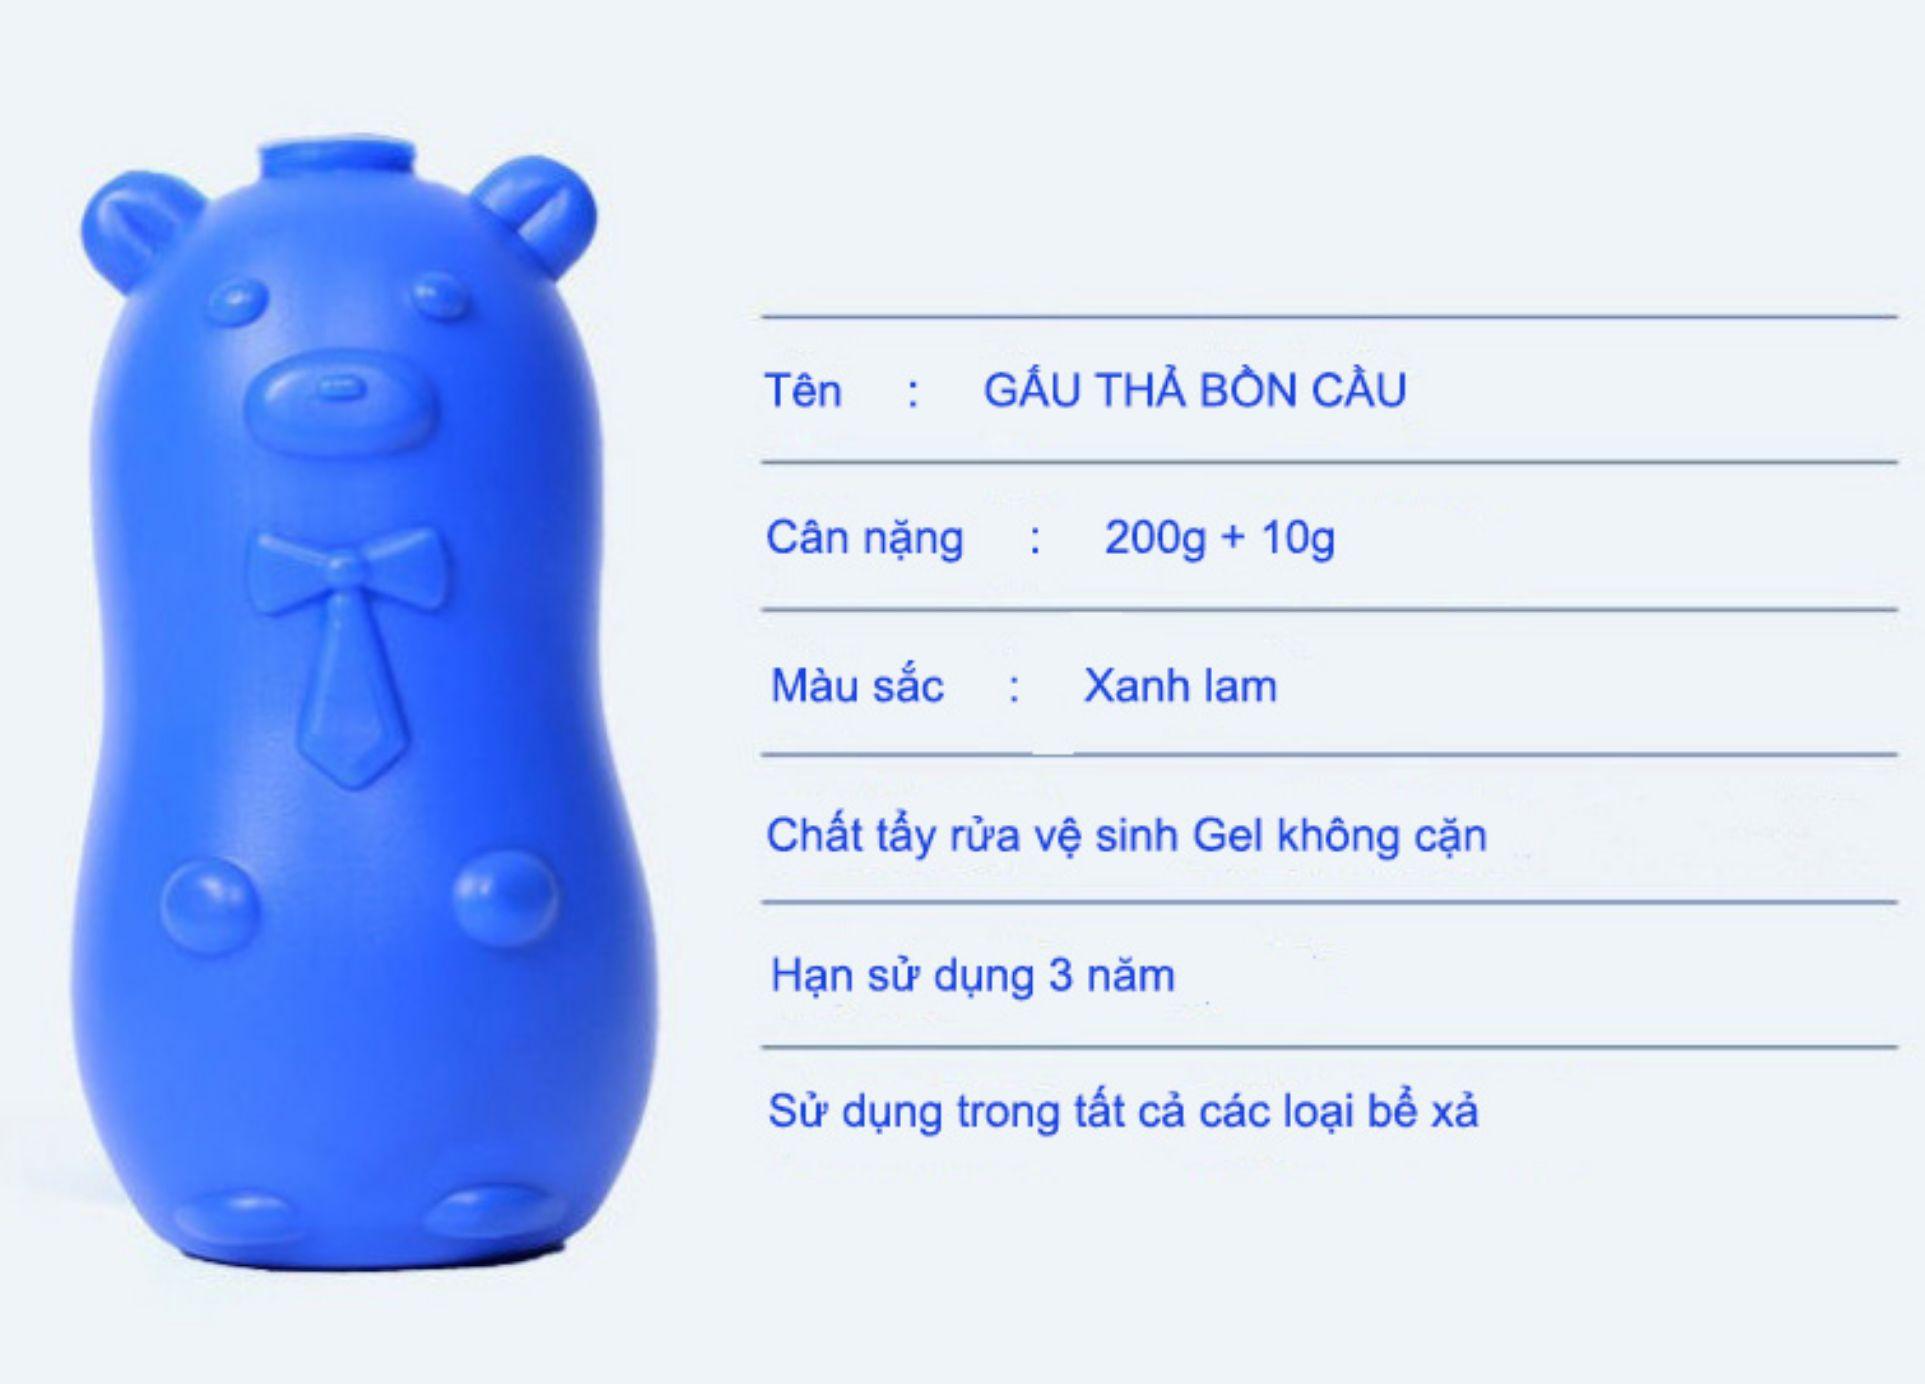 Gấu vệ sinh bồ cầu